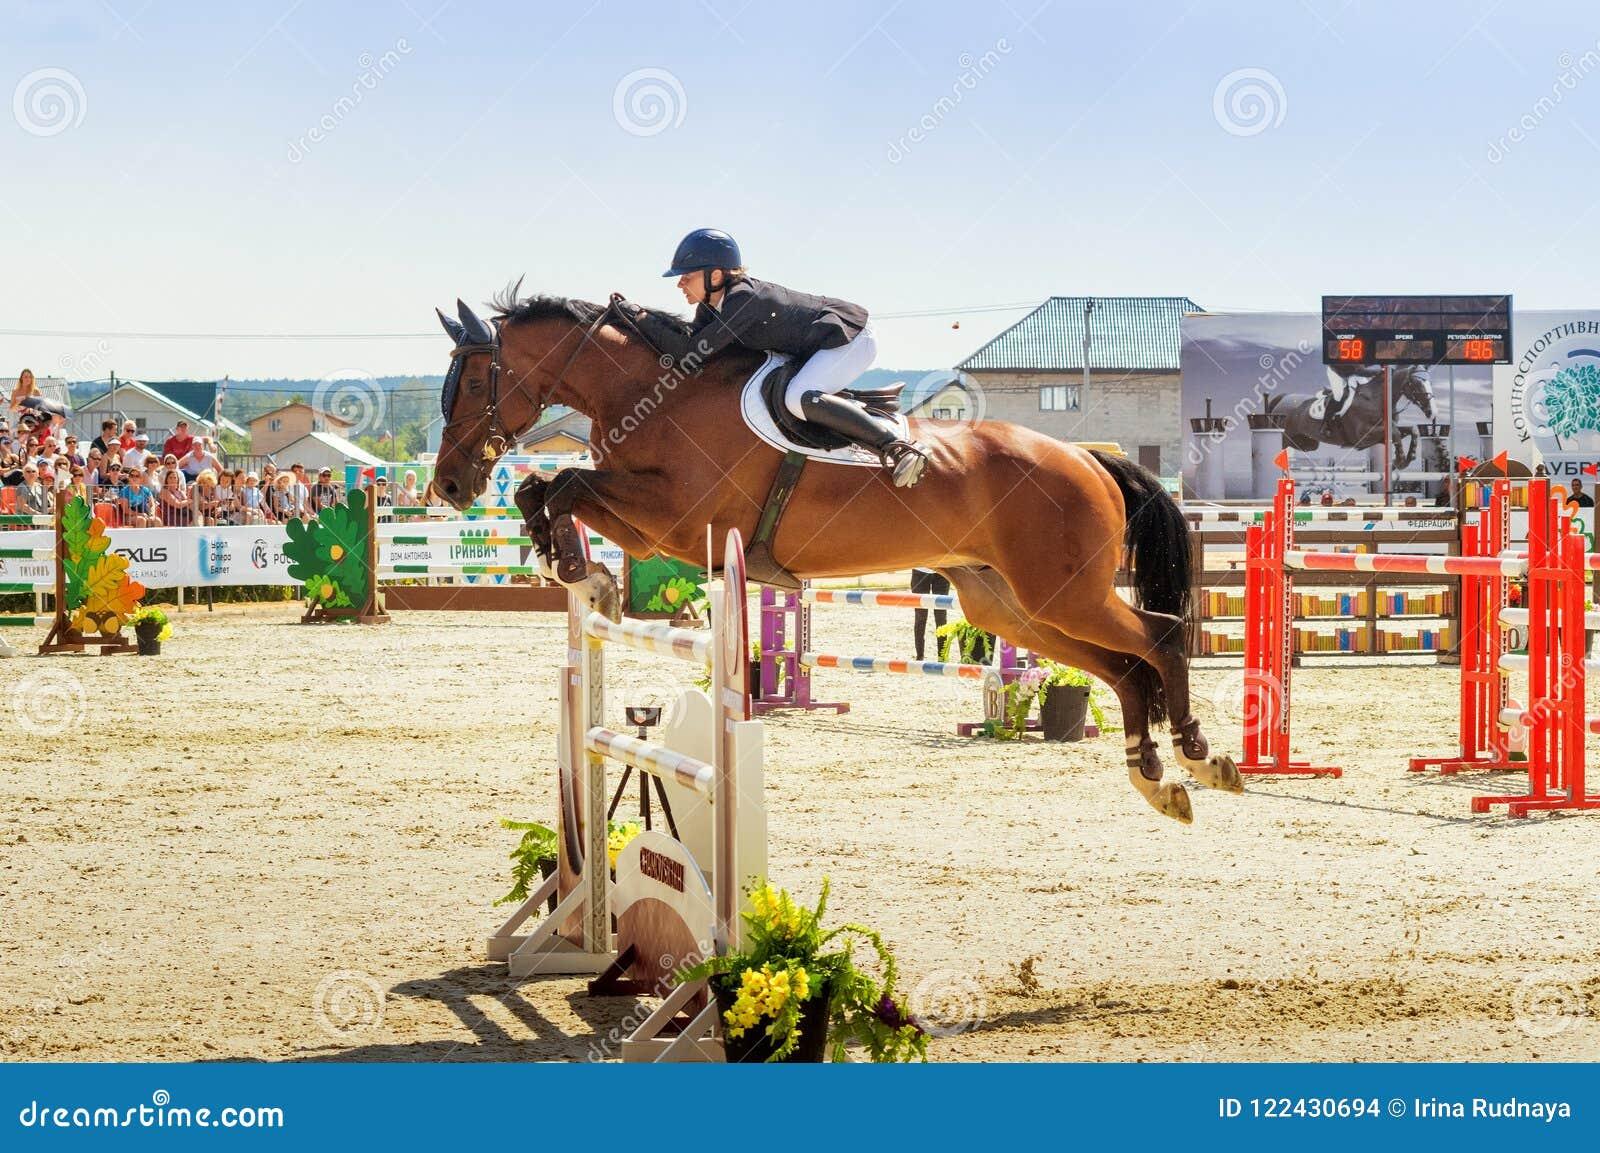 Competições de salto do cavalo internacional, Rússia, Ekaterinburg, 28 07 2018